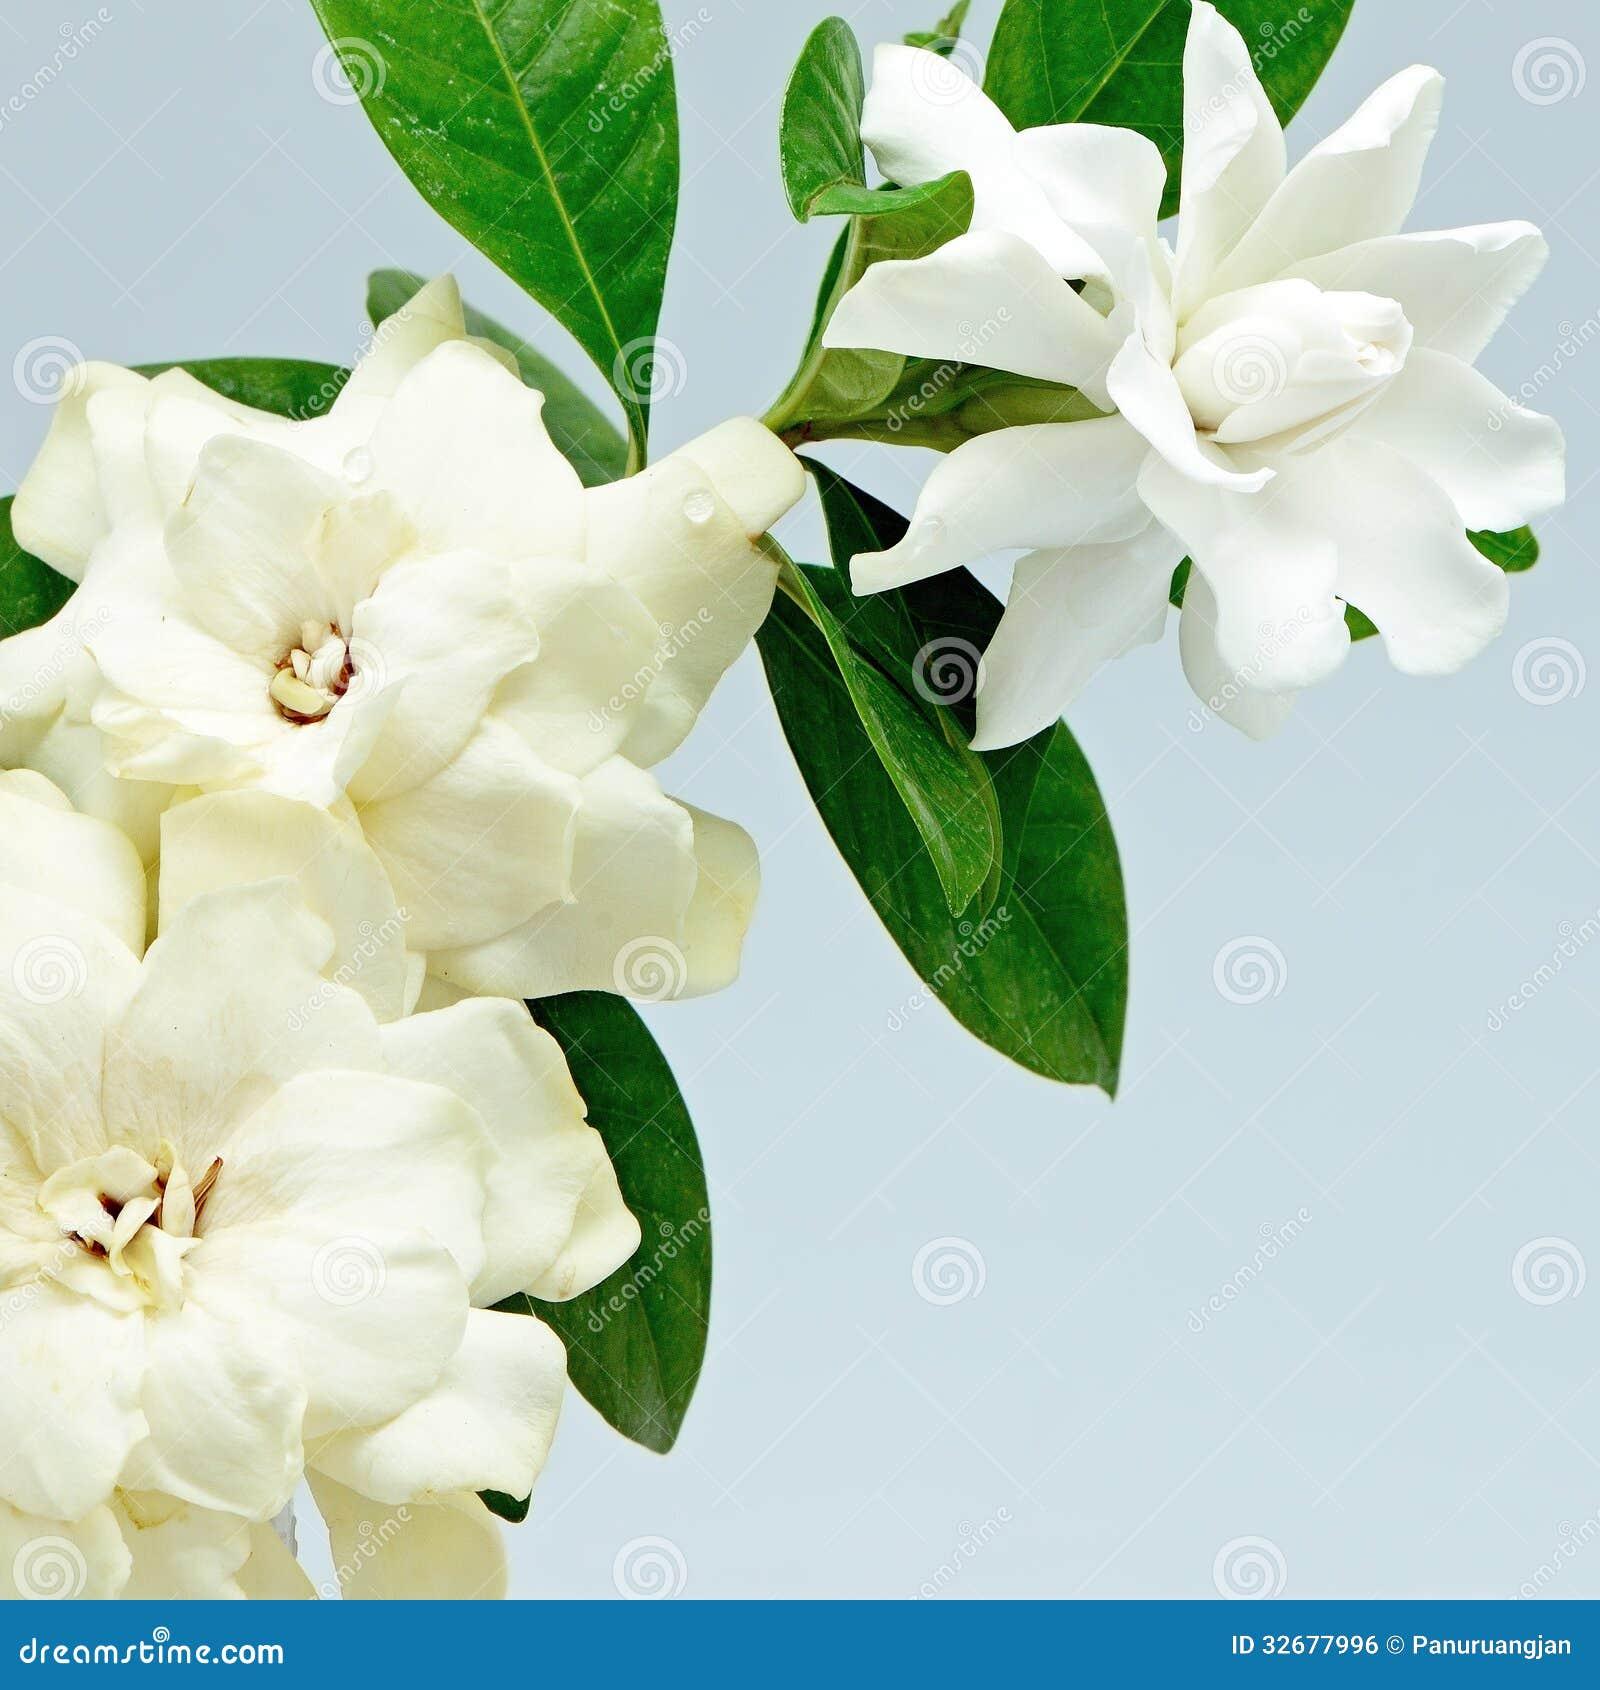 Cannonball tree flower stock photo image of bright bangkok 34410468 gardenia royalty free stock image izmirmasajfo